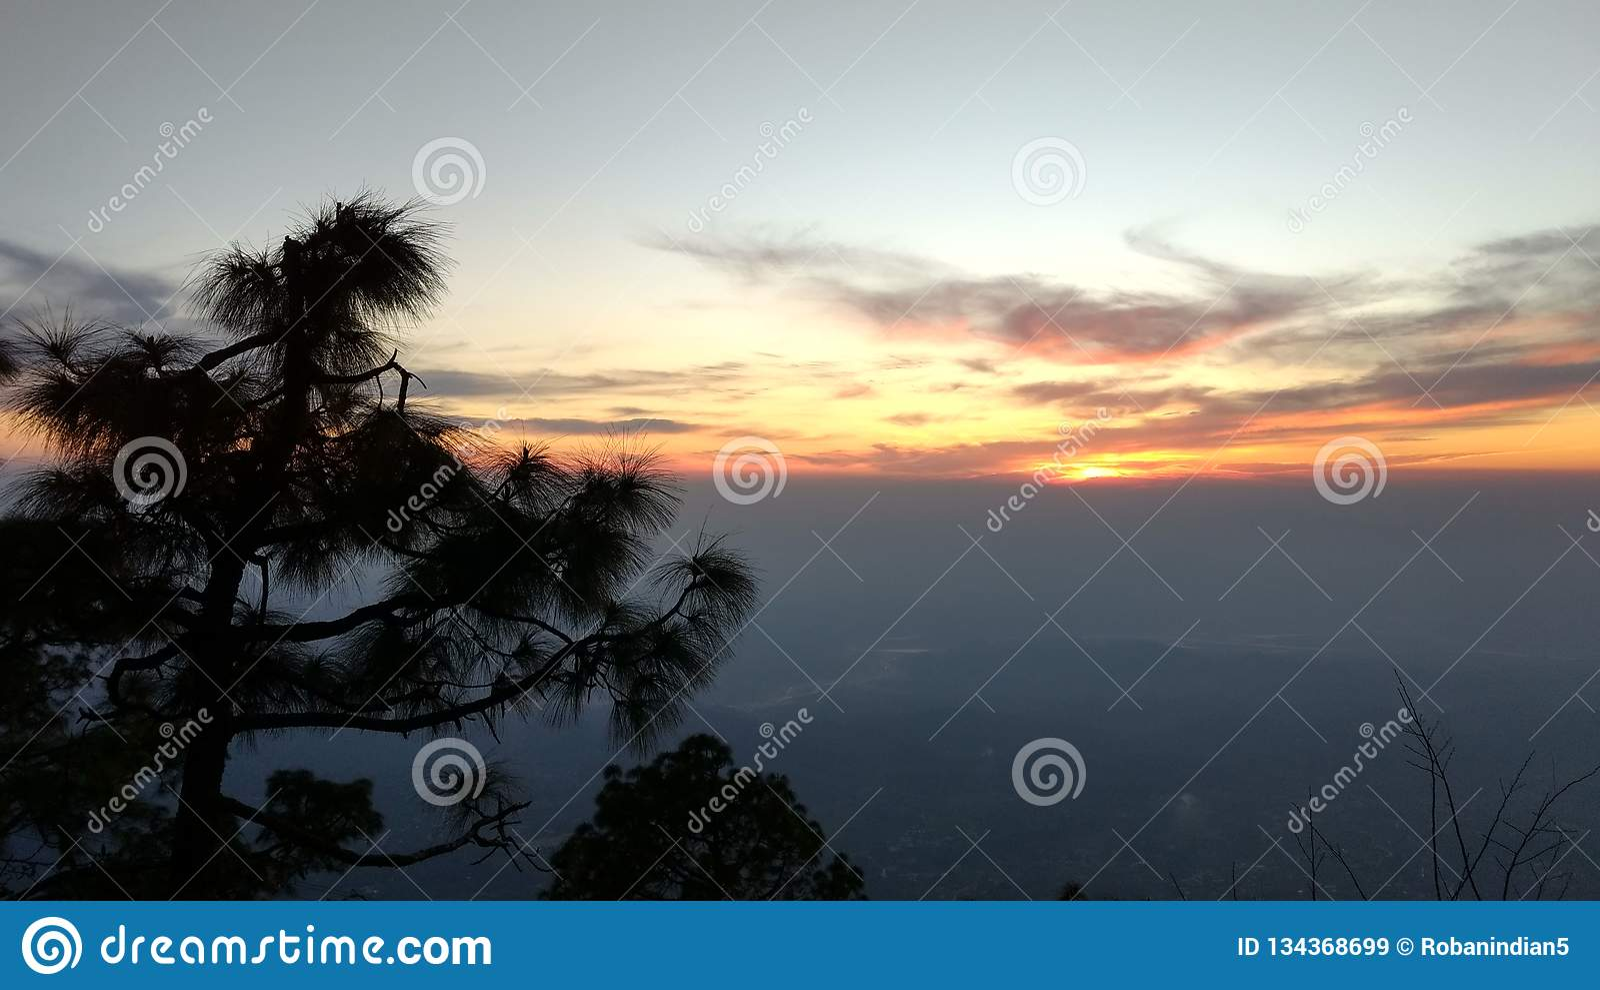 Mountains view at Vaishno devi temple